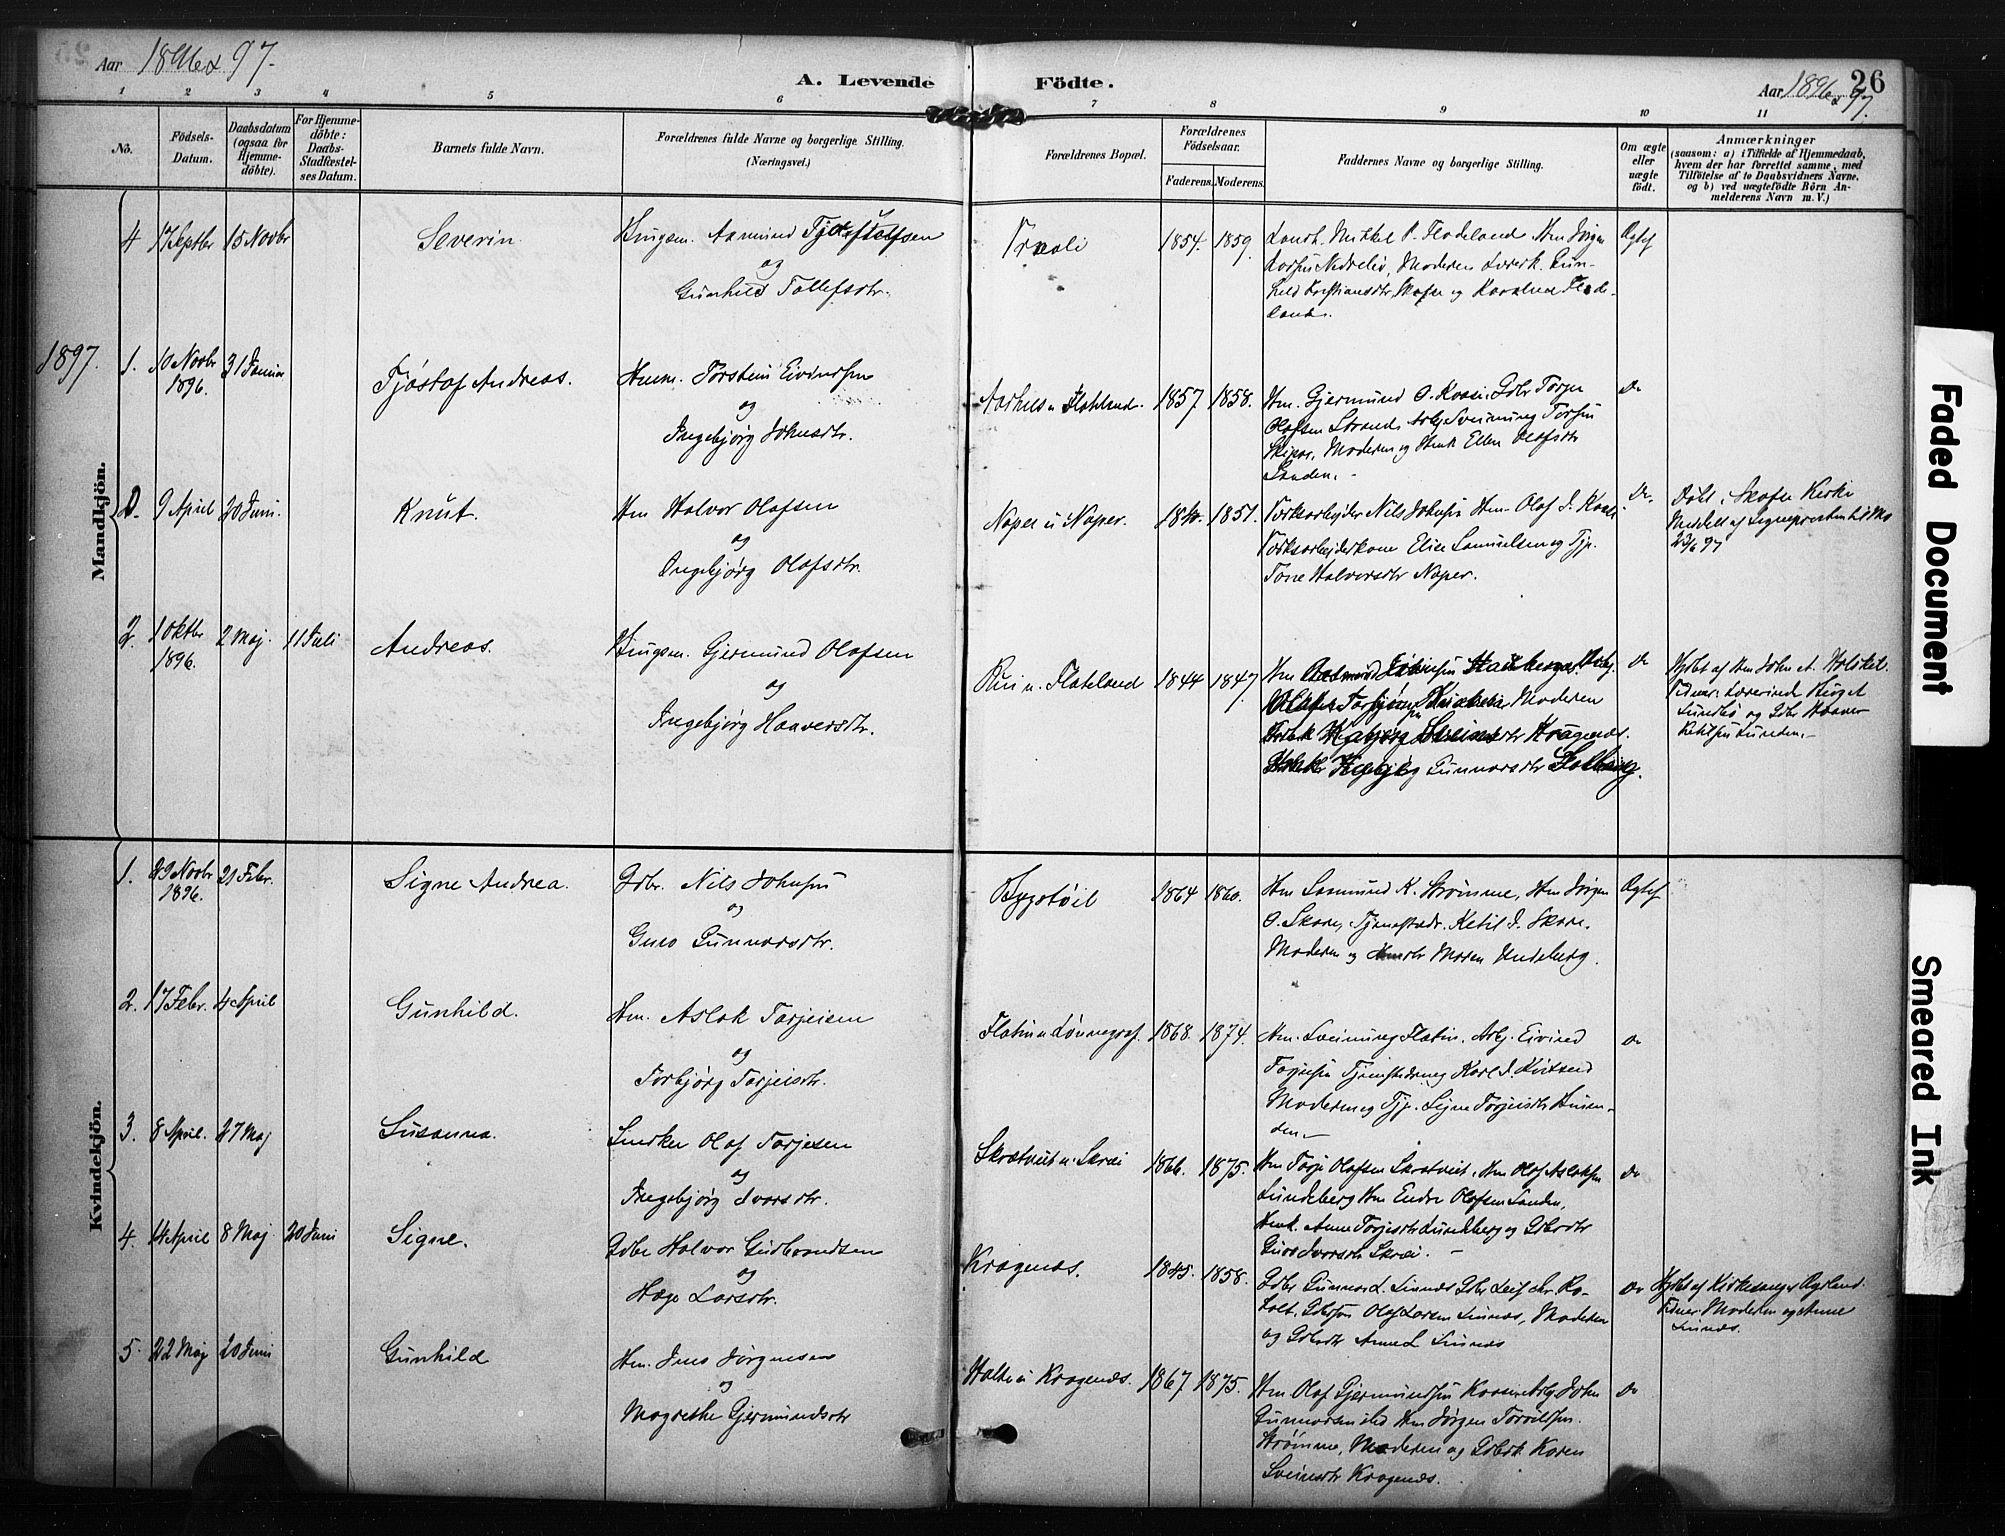 SAKO, Kviteseid kirkebøker, F/Fc/L0002: Ministerialbok nr. III 2, 1882-1908, s. 26